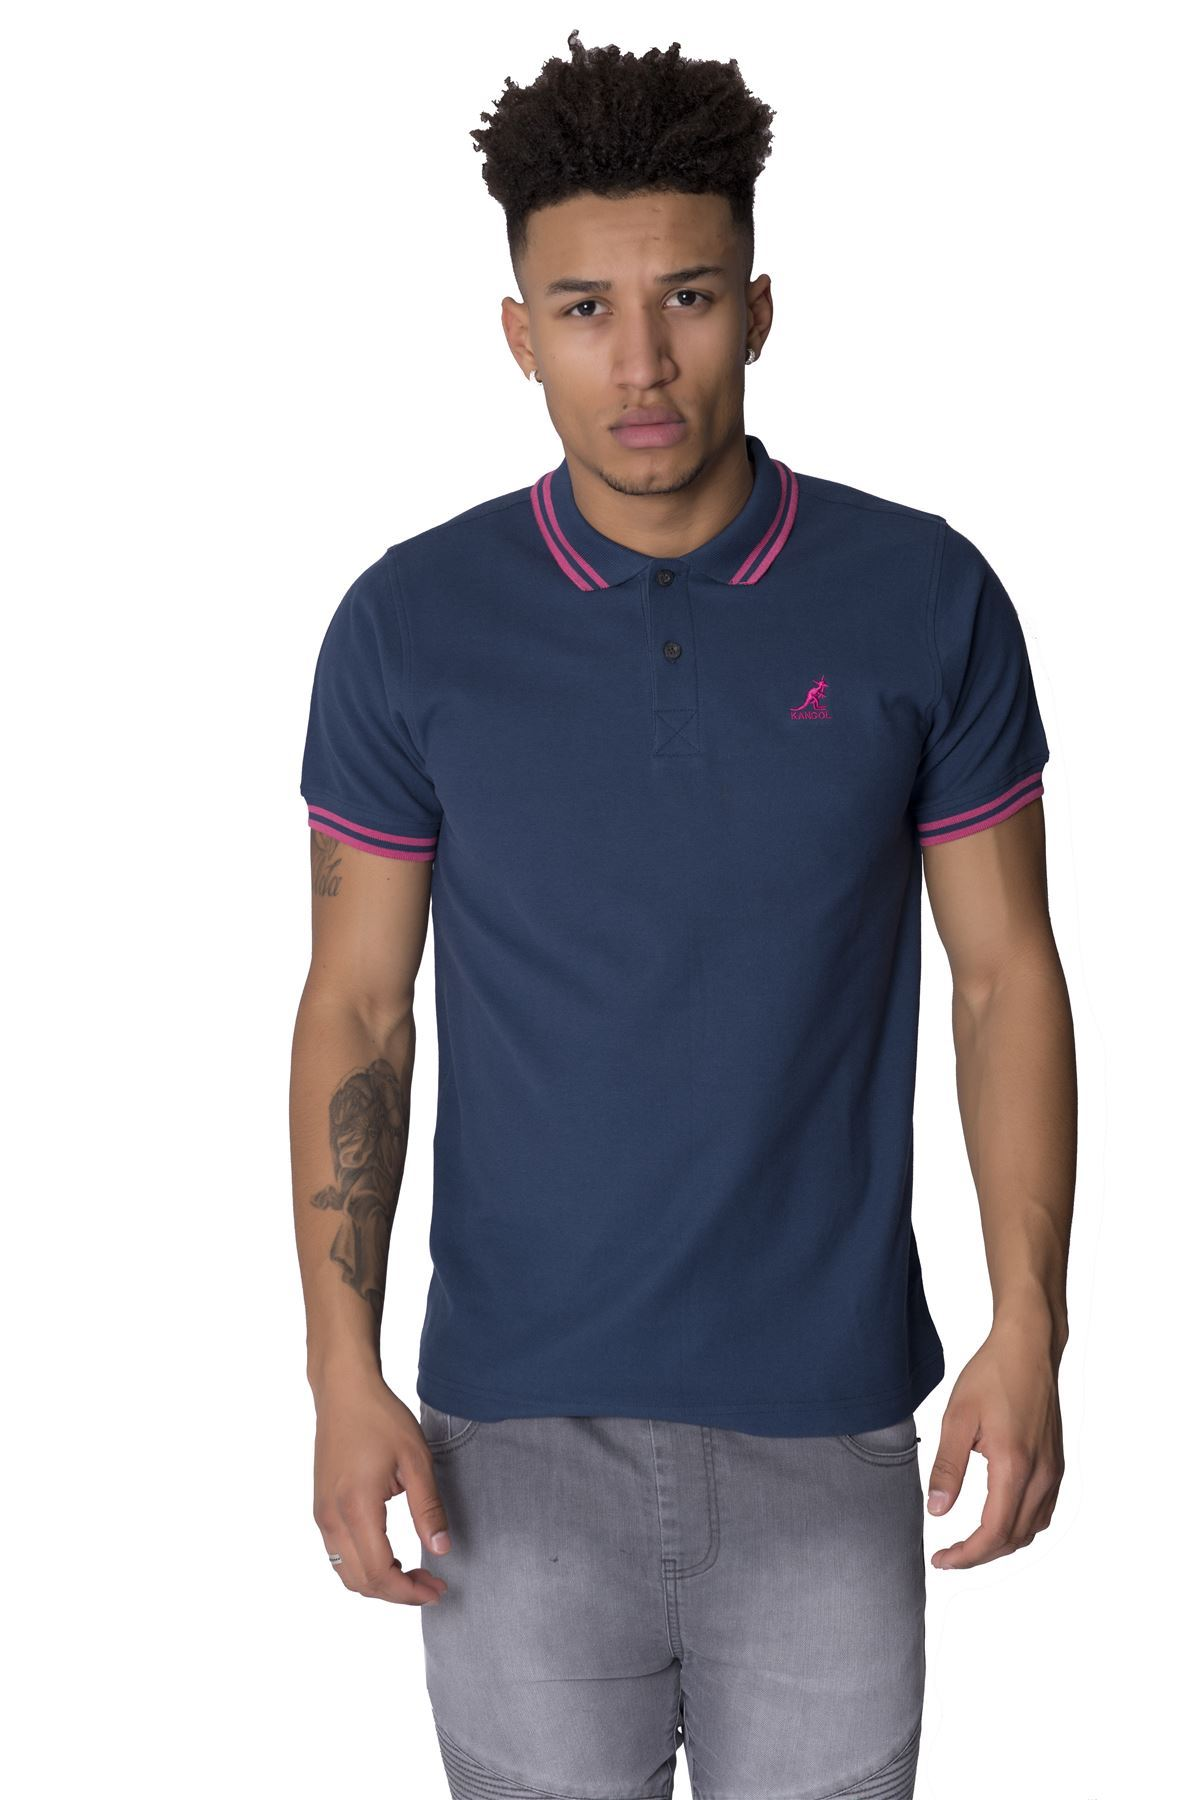 Kangol joshua new big mens plus size short sleeve polo for Big mens t shirts